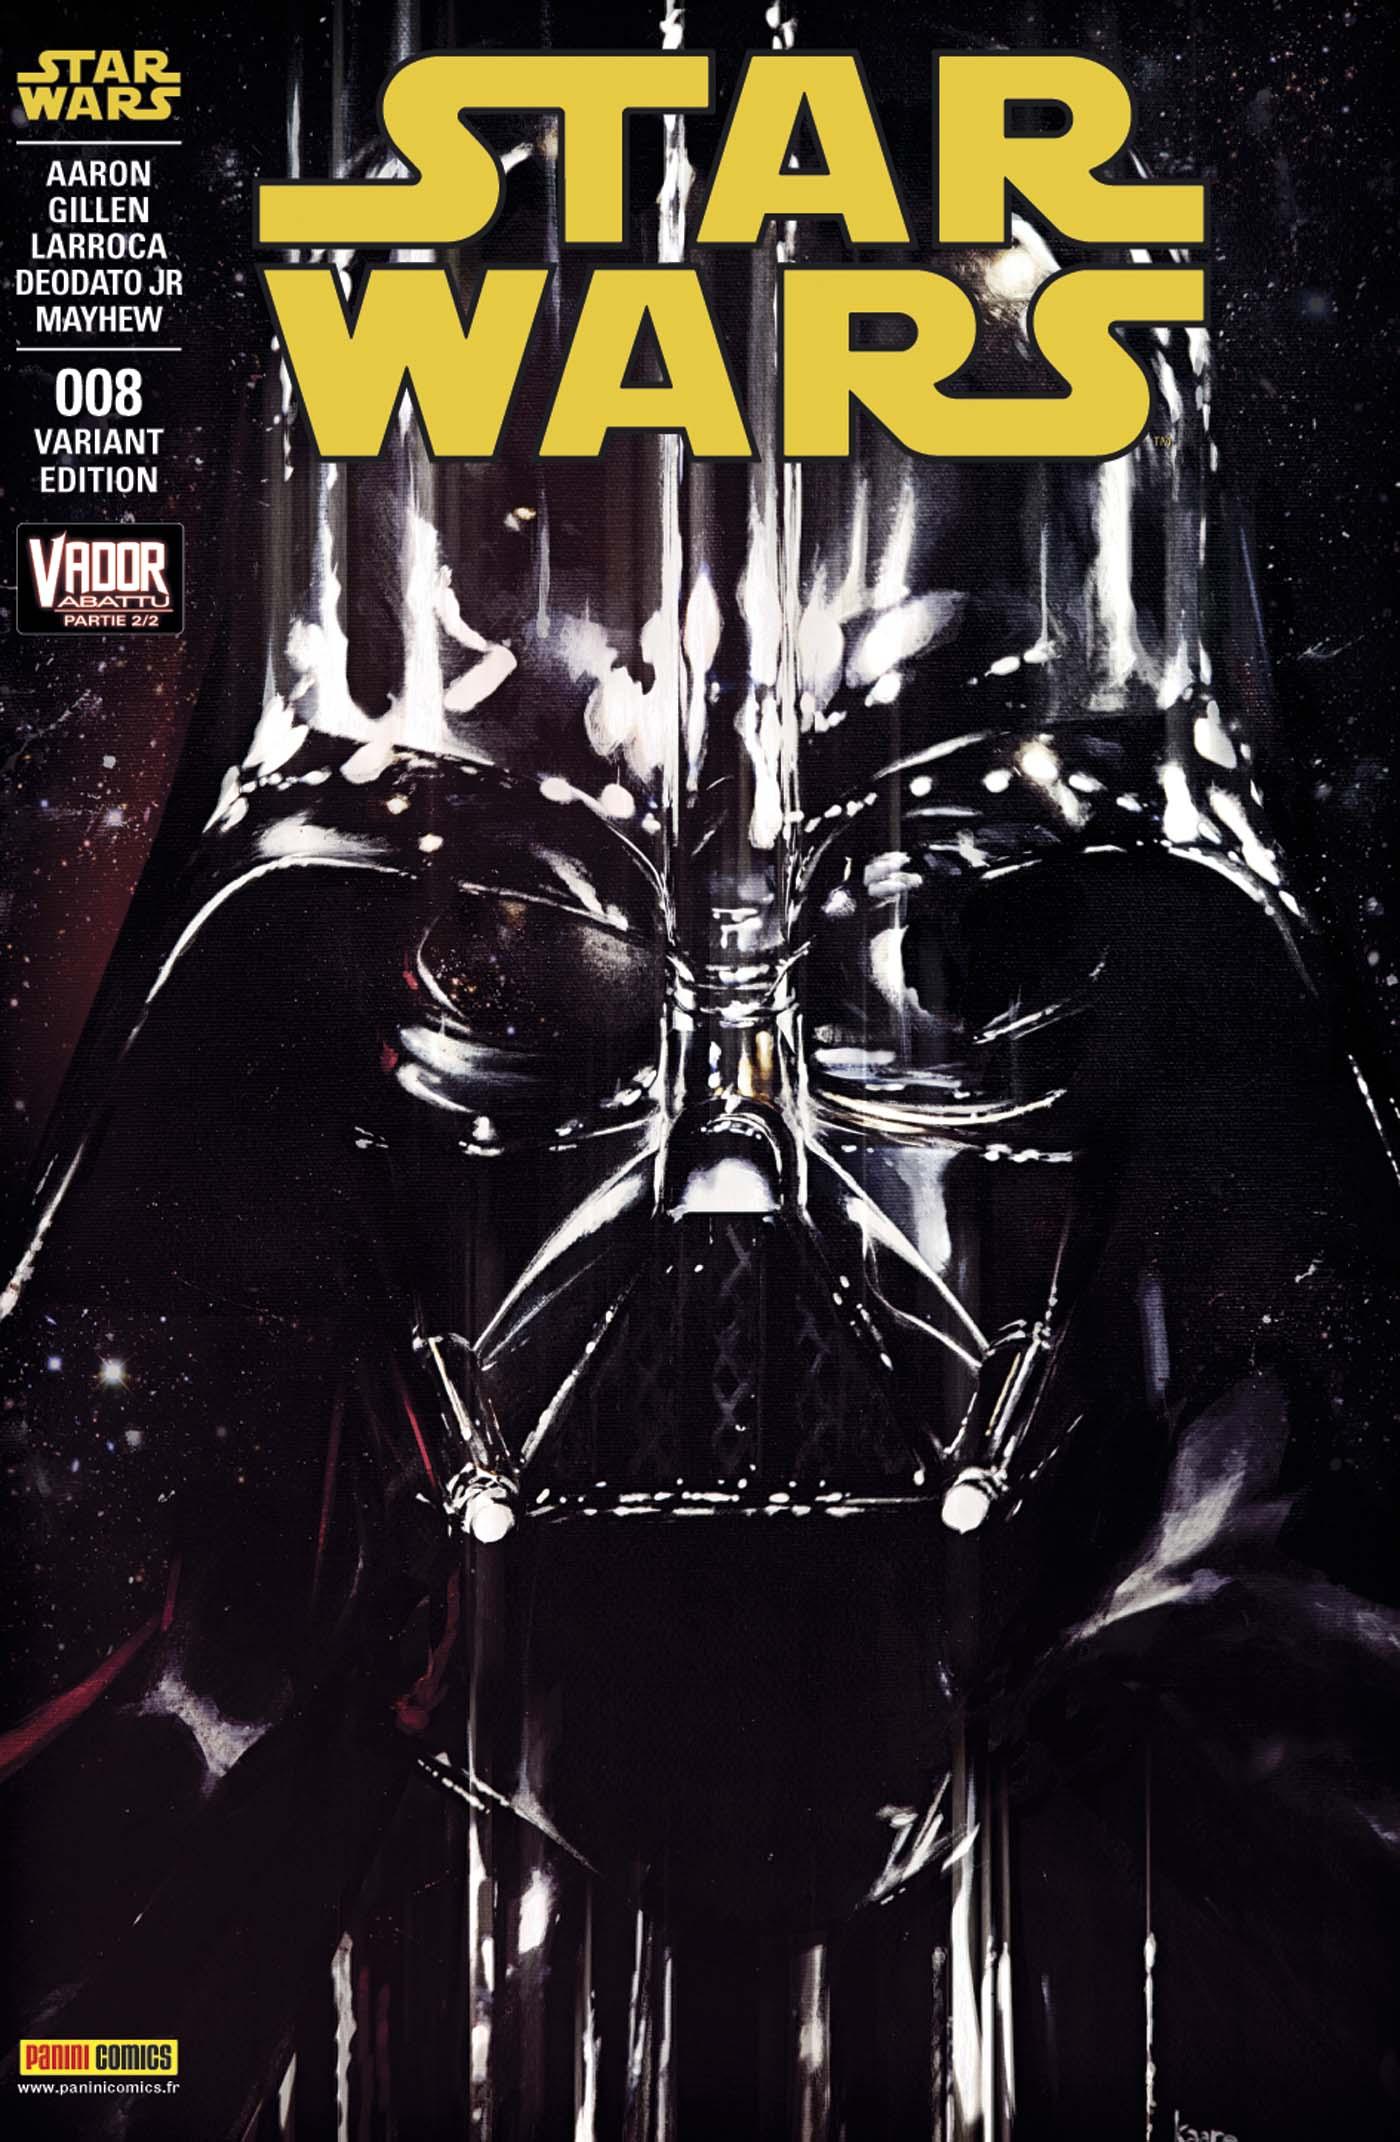 Star Wars Comics 8 - Couverture B